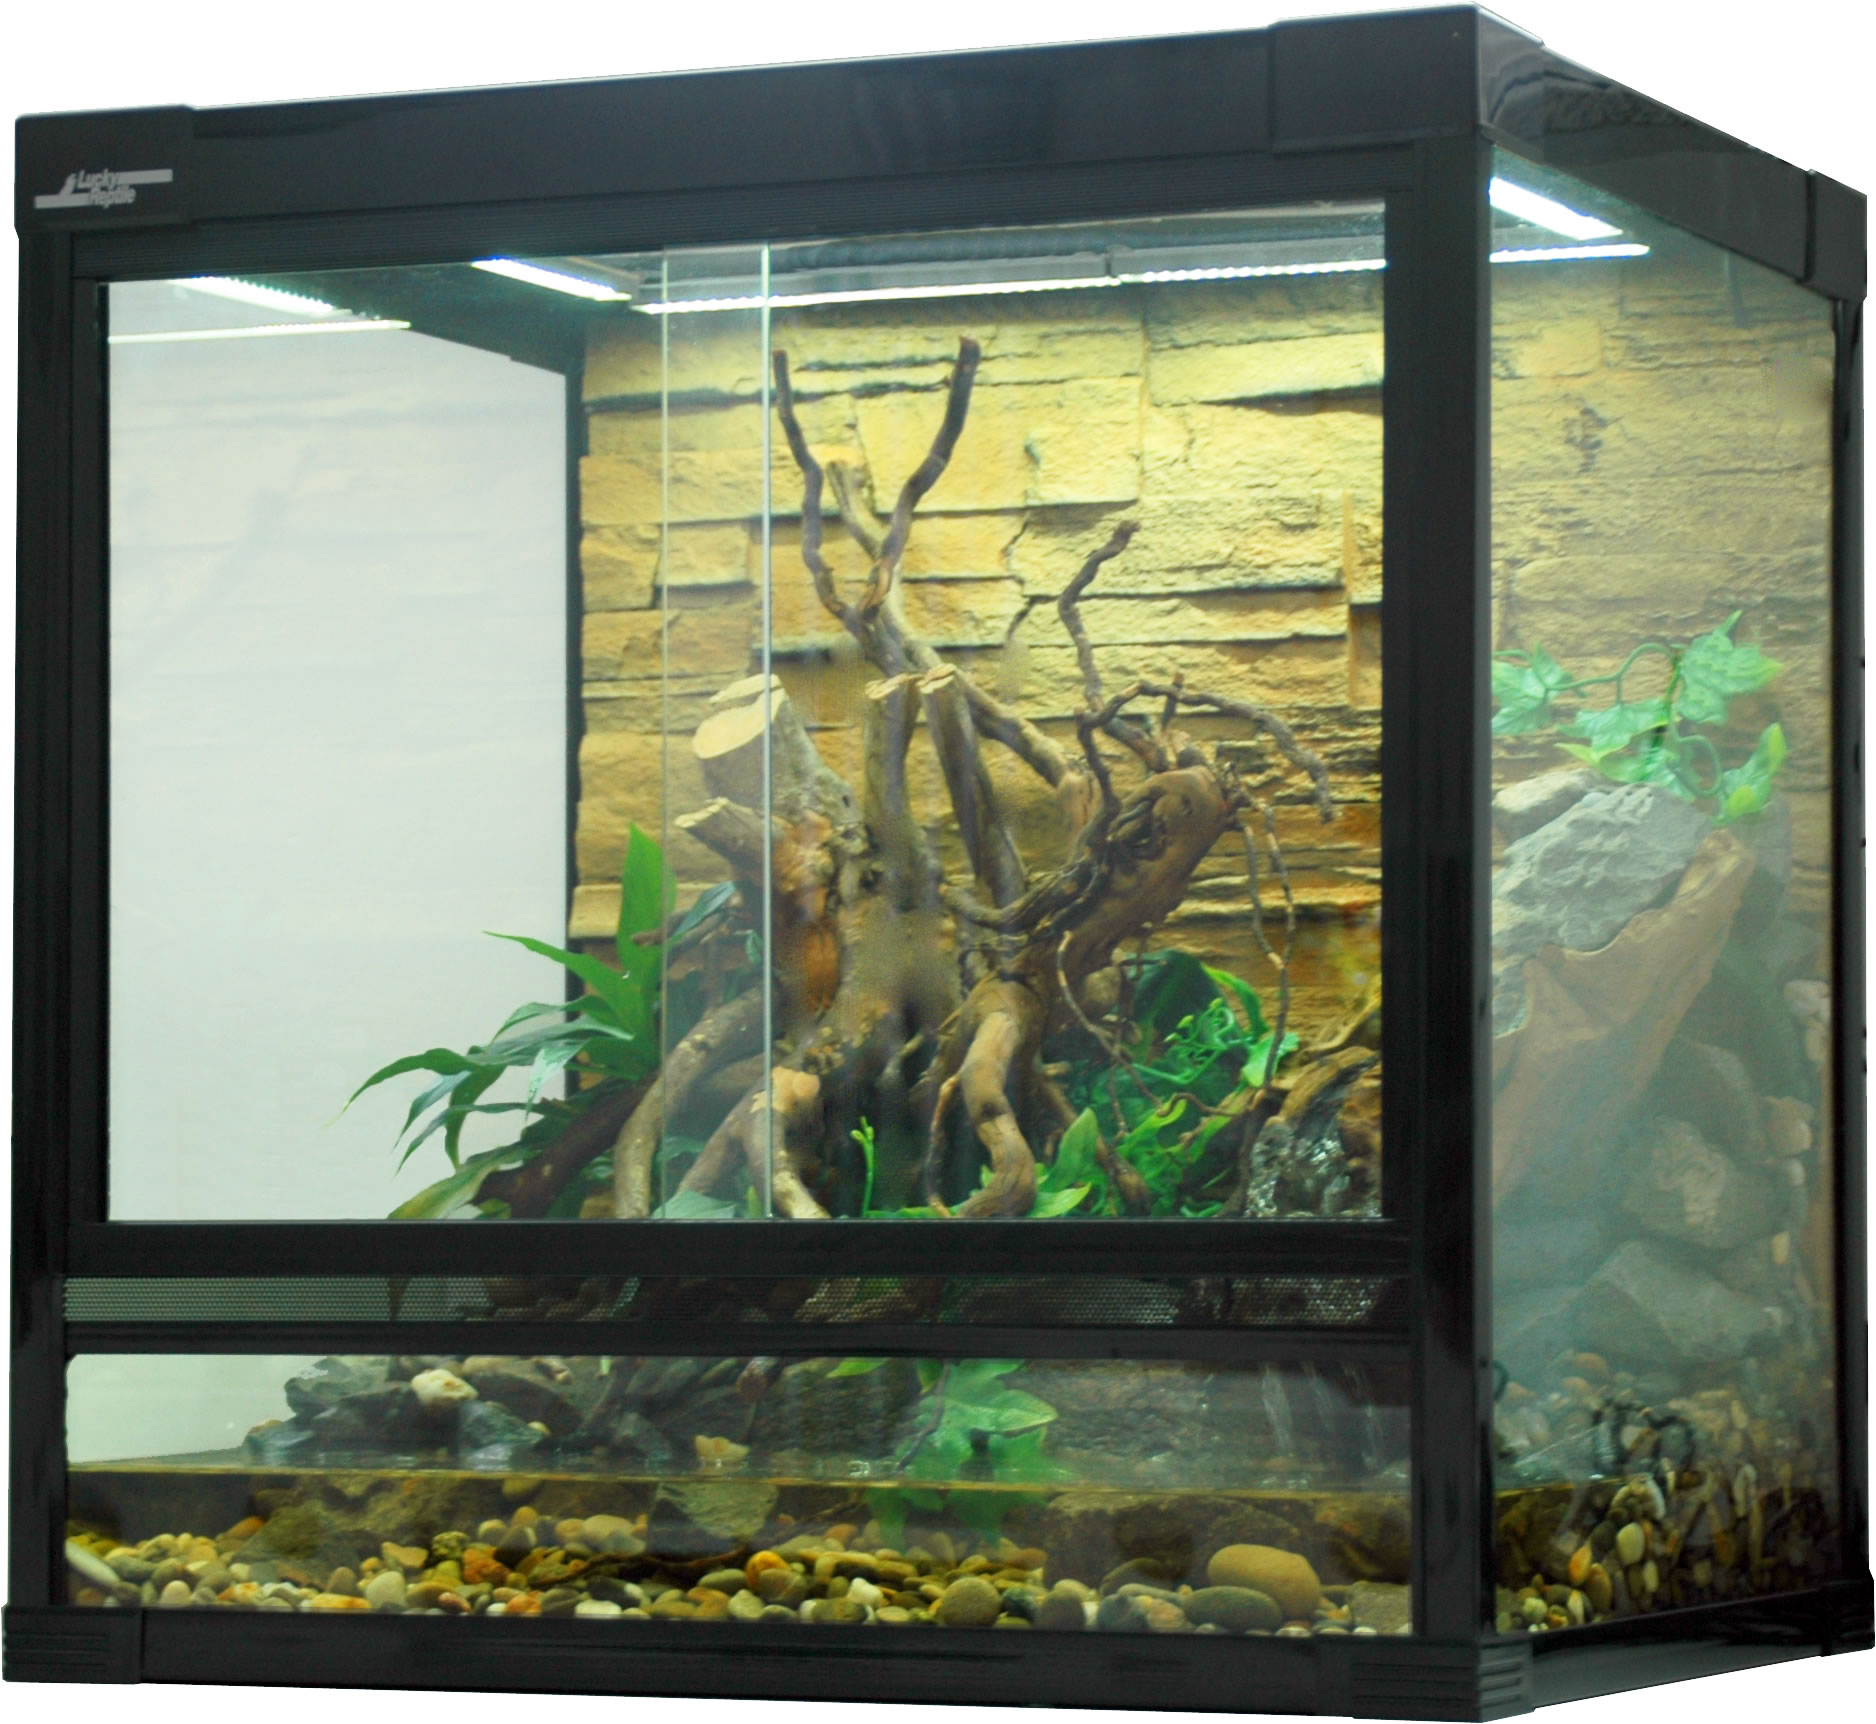 Aquaristic Net Lucky Reptile Fire Bellied Toad Terrarium